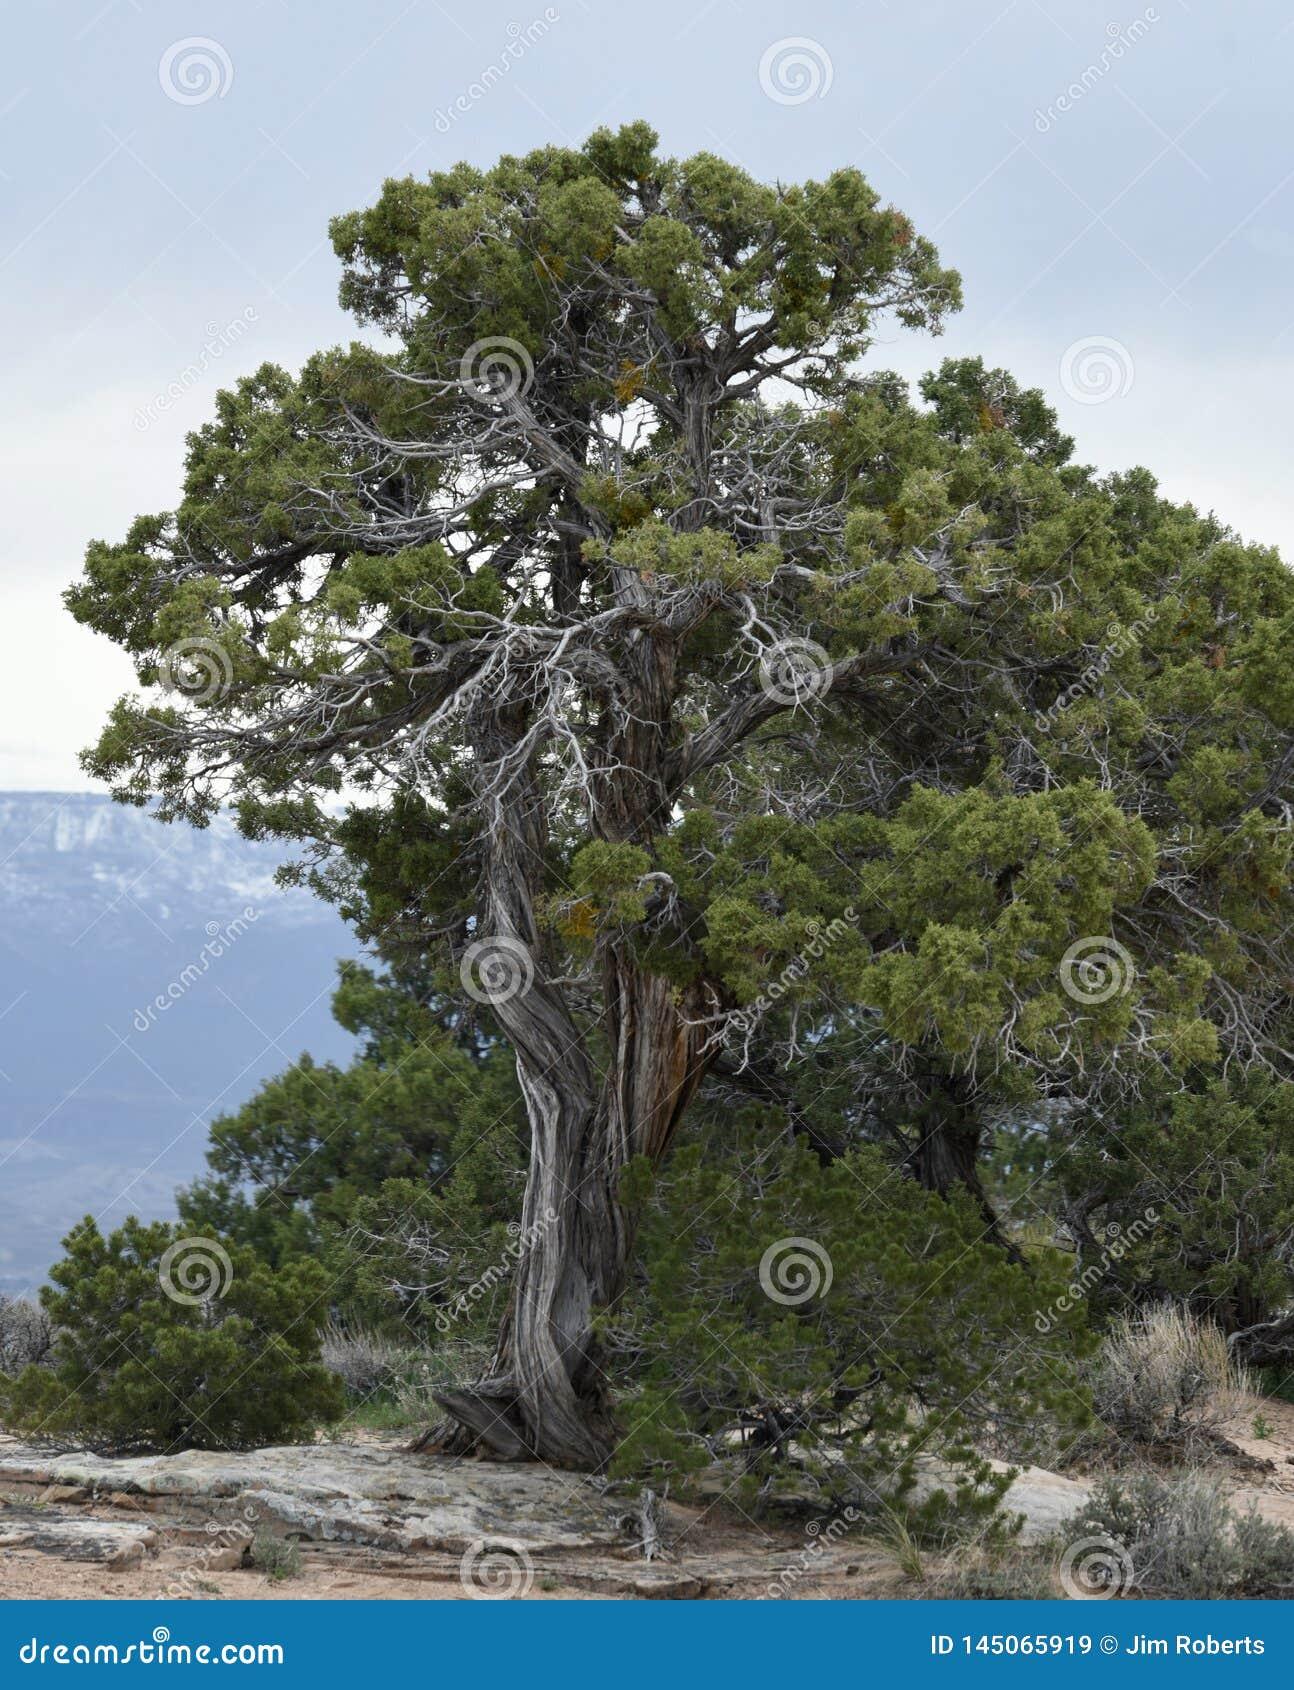 A Common Juniper Tree